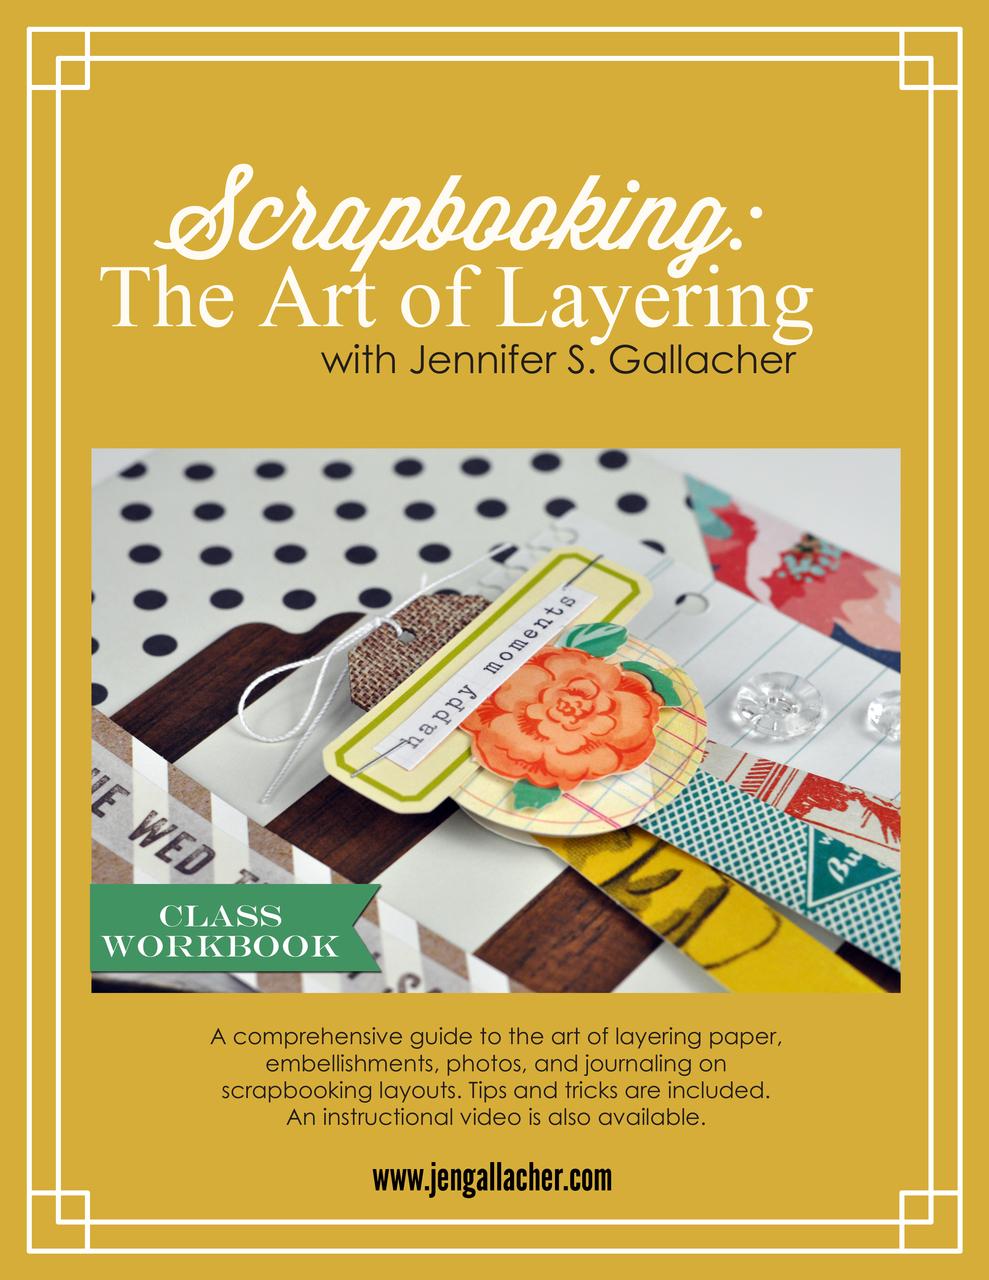 Scrapbooking: The Art of Layering Ebook